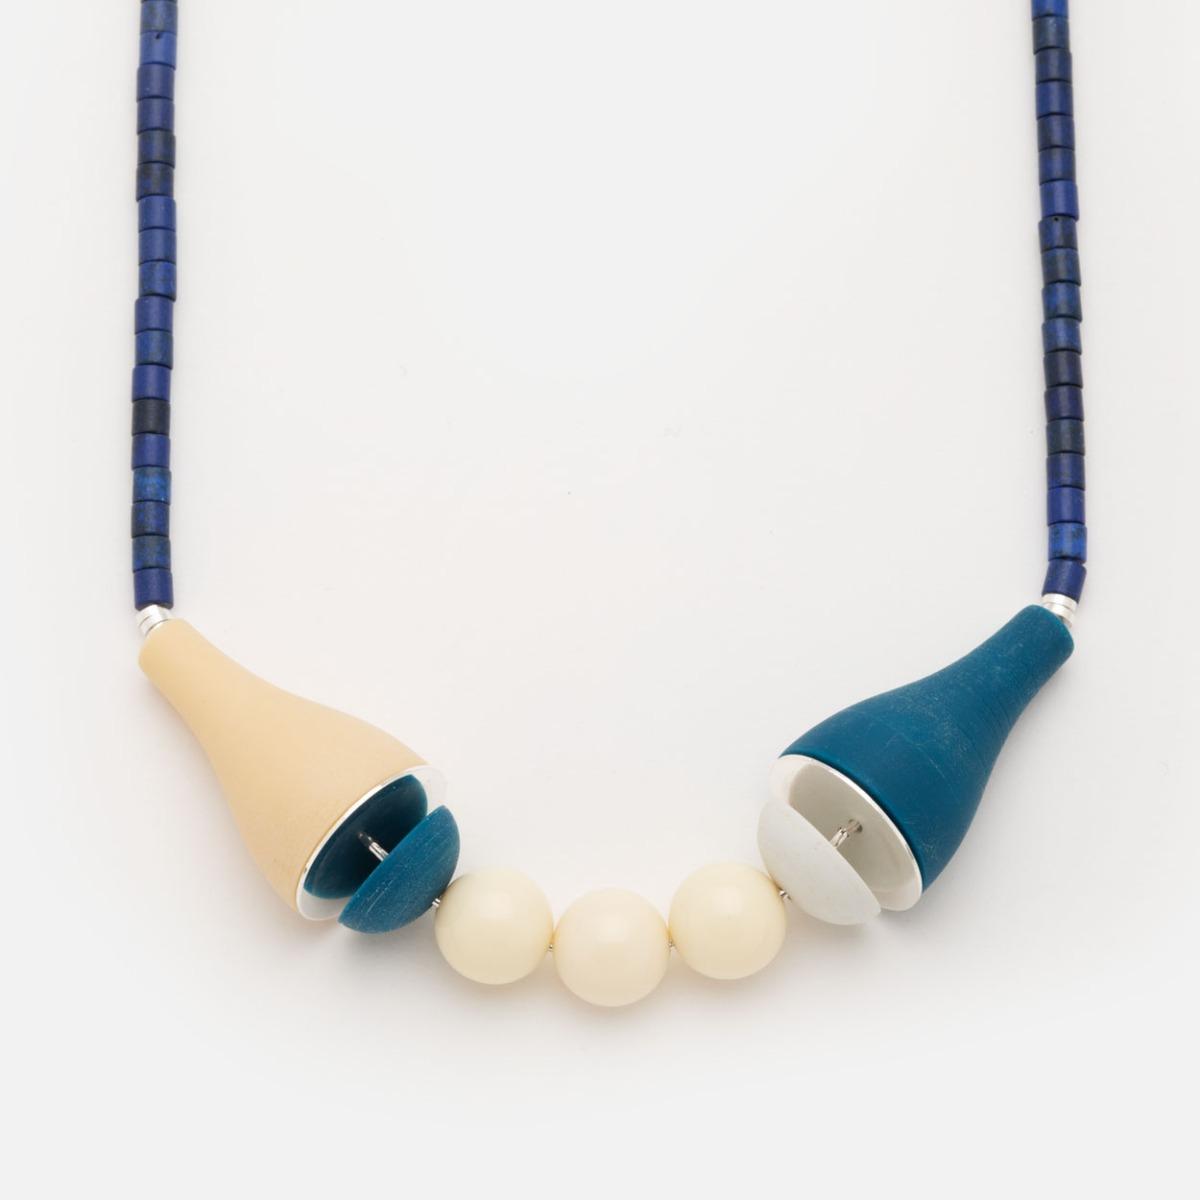 Vessel necklace